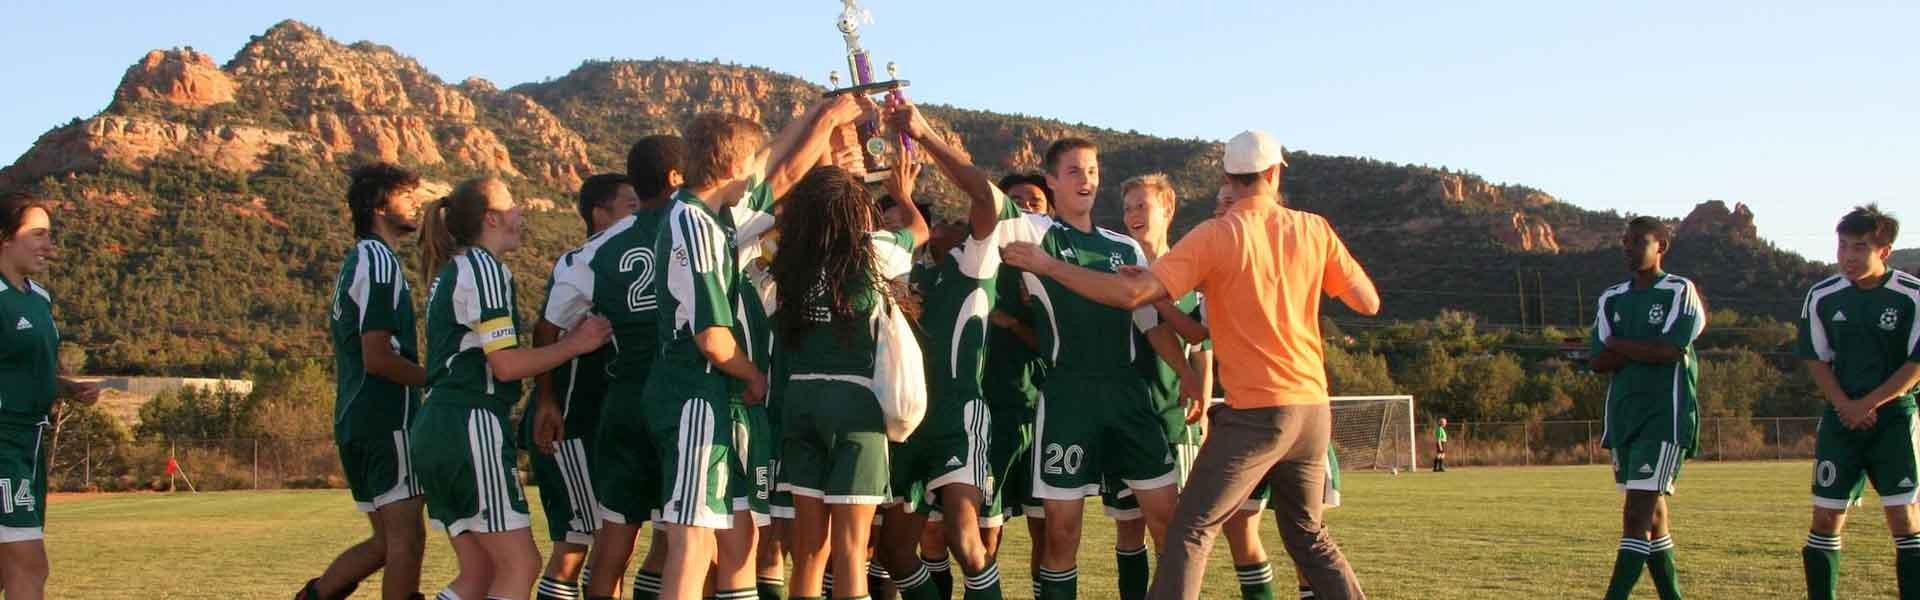 VerdeValleySchool-Highschool-Arizona-Soccercup-MAin-Banner-2019